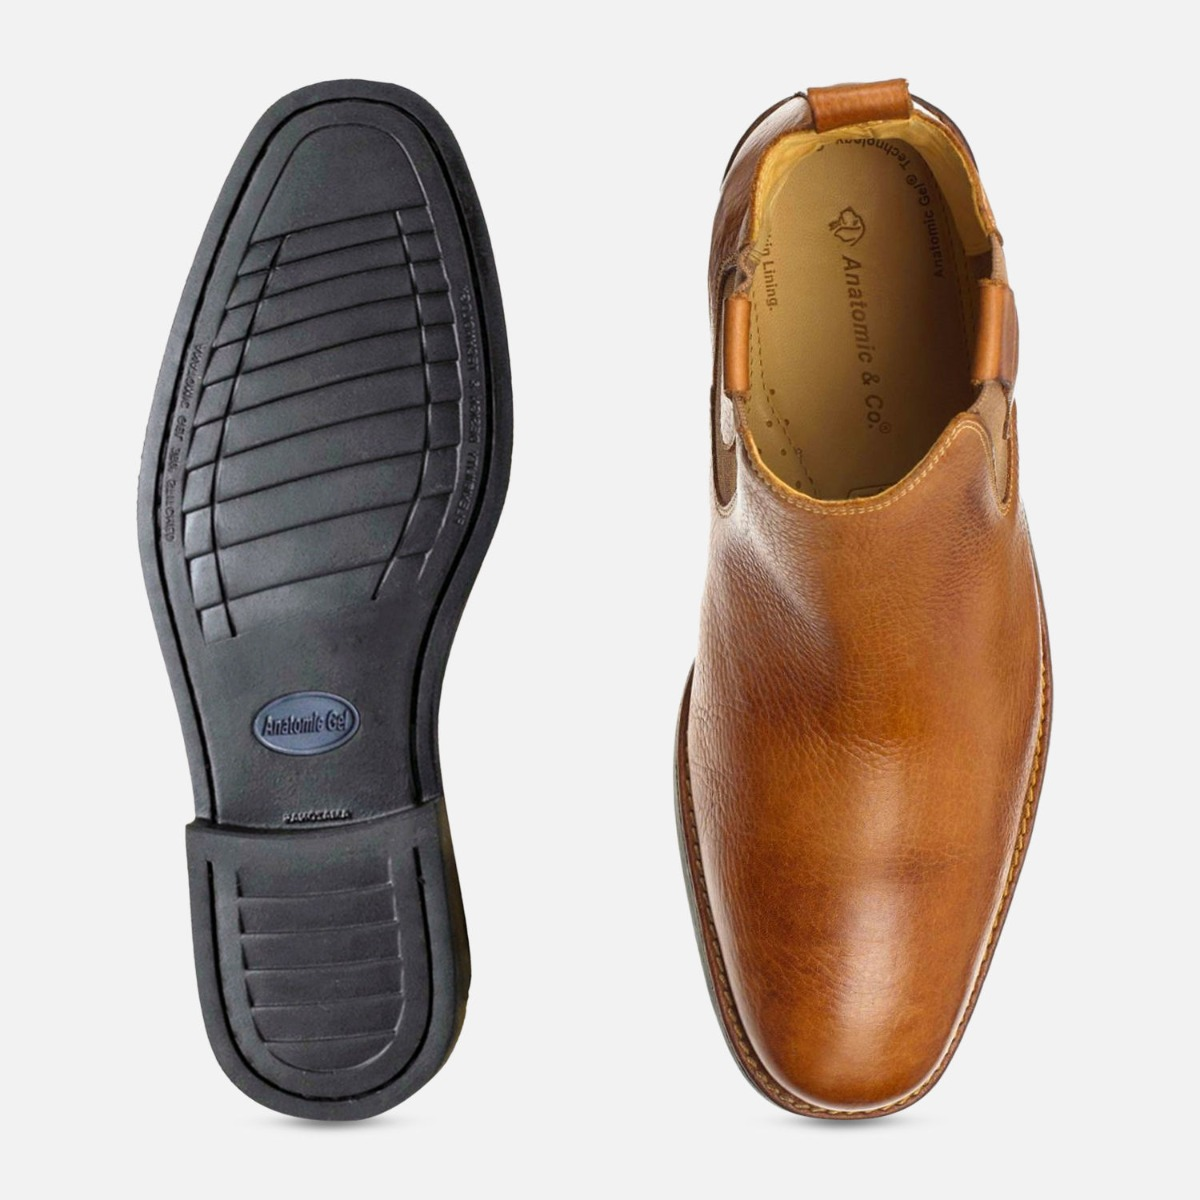 Formal Cognac Mens Chelsea Boots Anatomic & Co